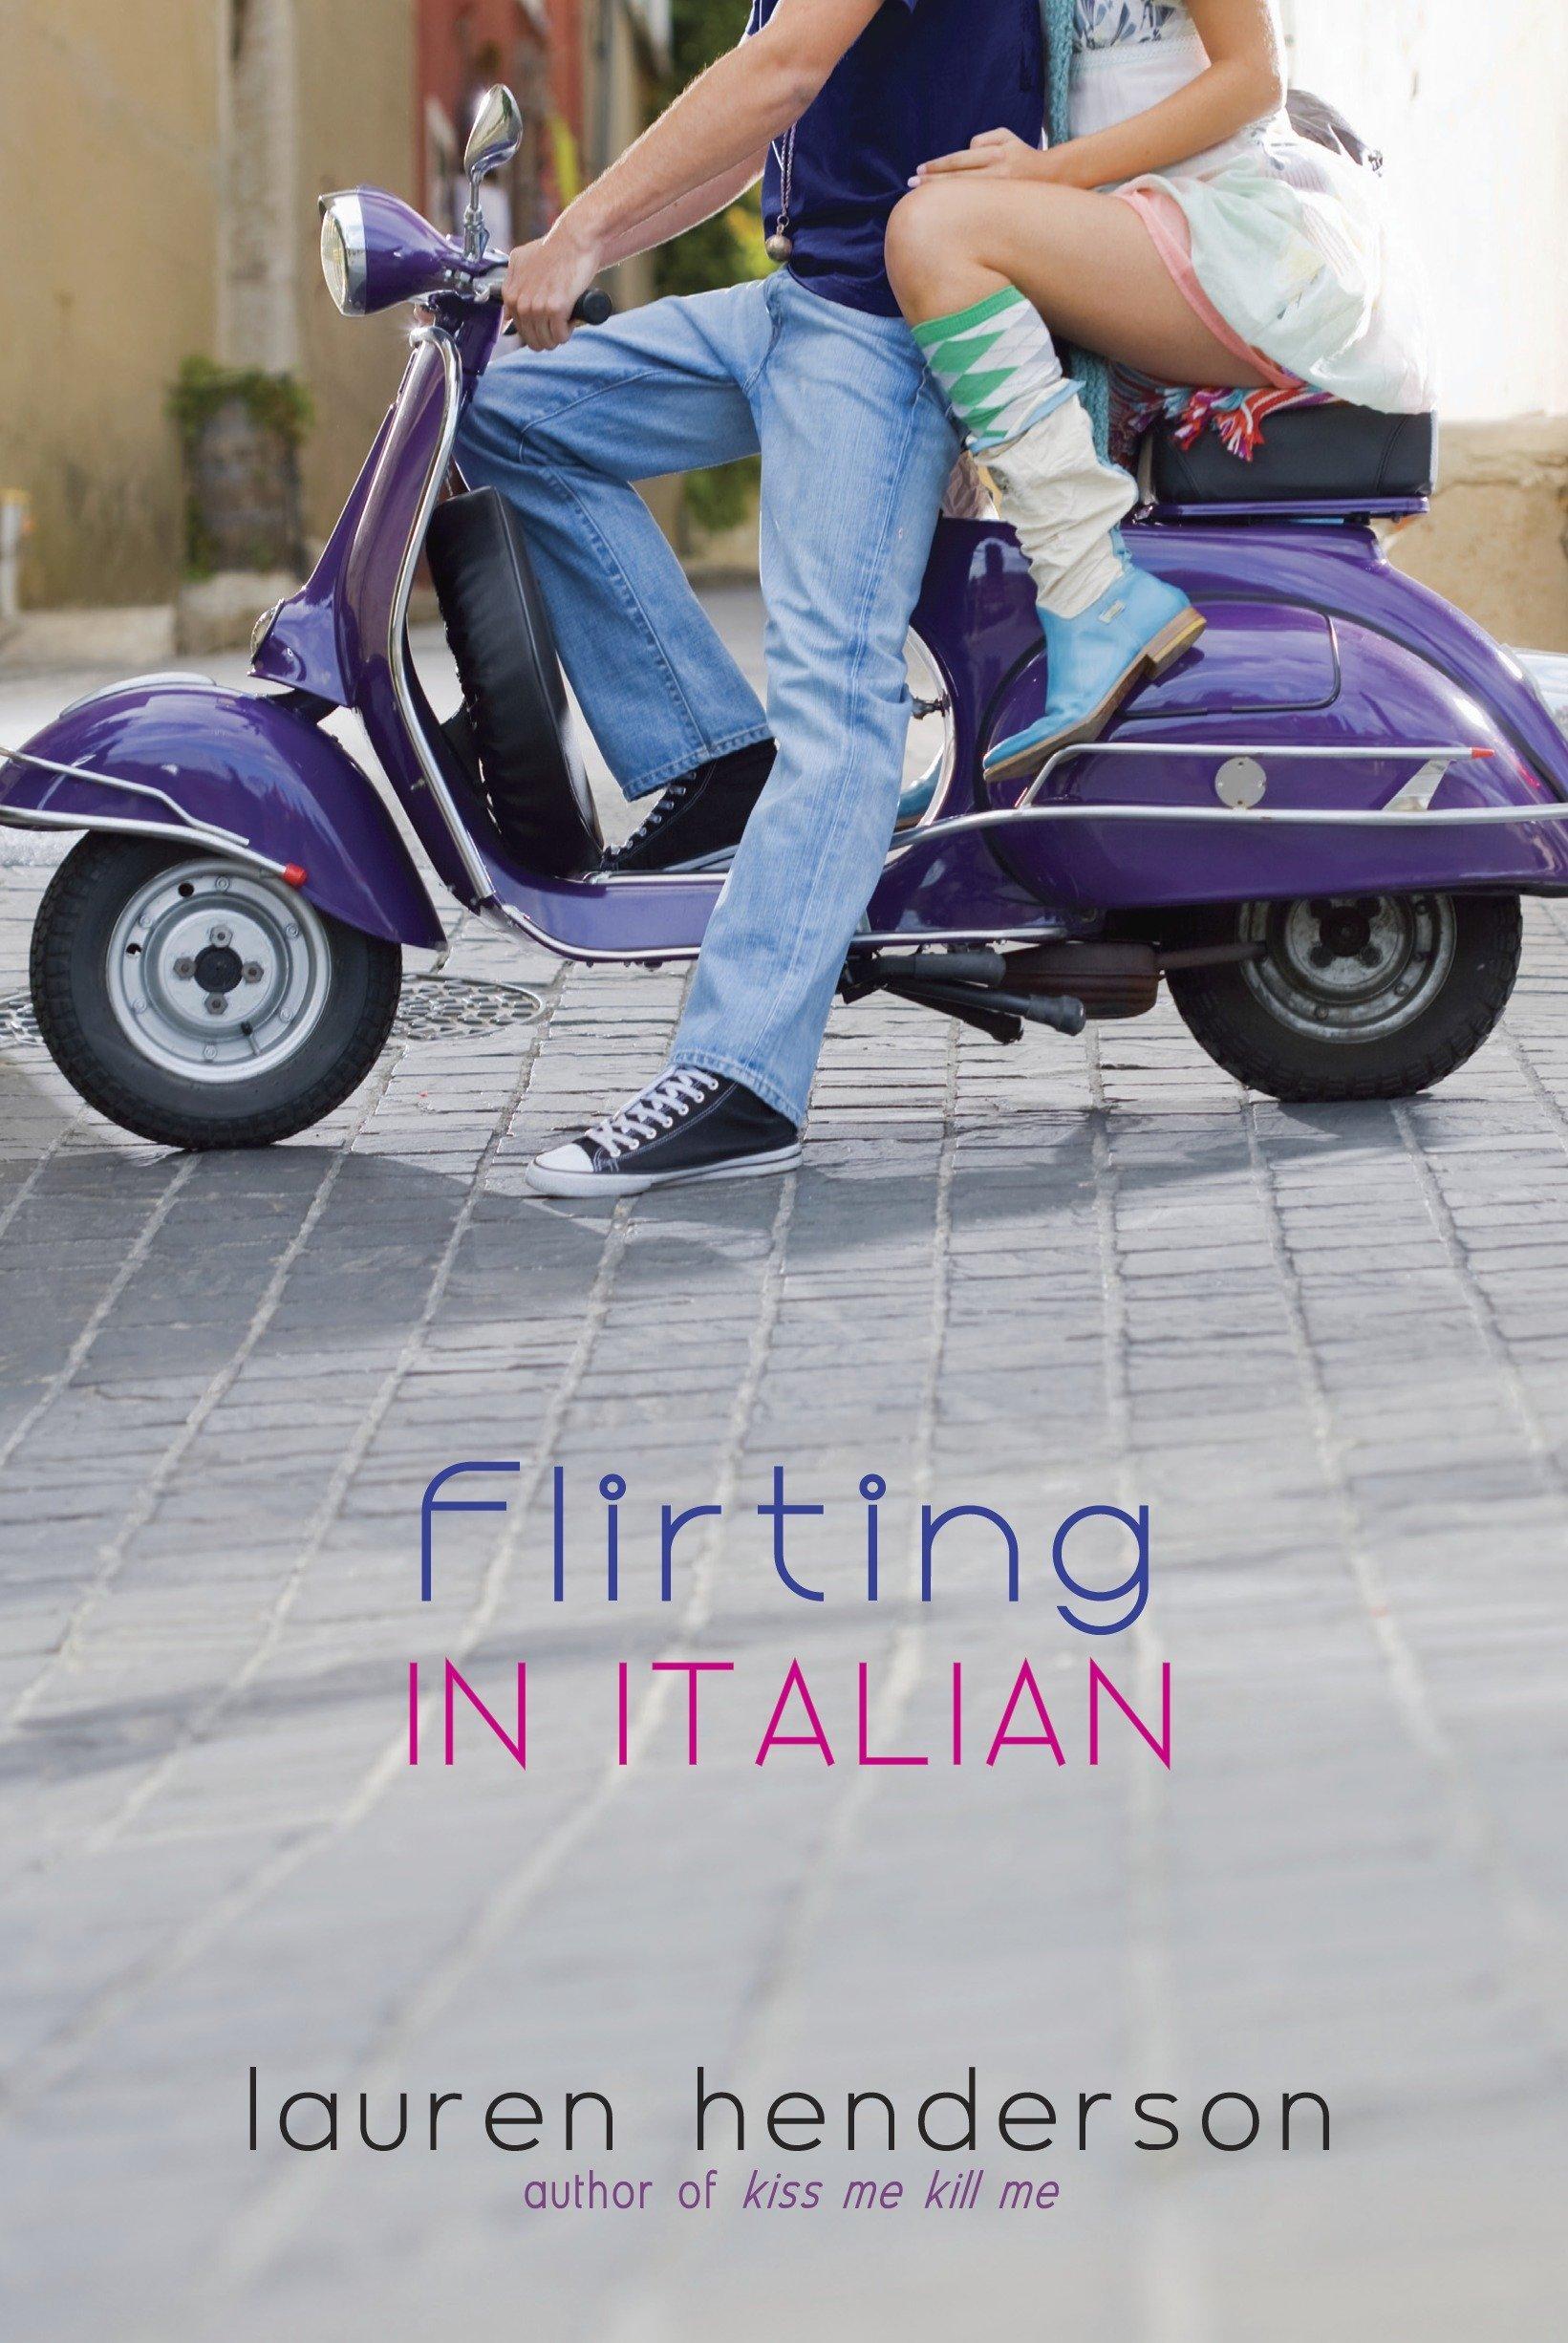 flirten auf italiano single rehna bhi ek talent hai